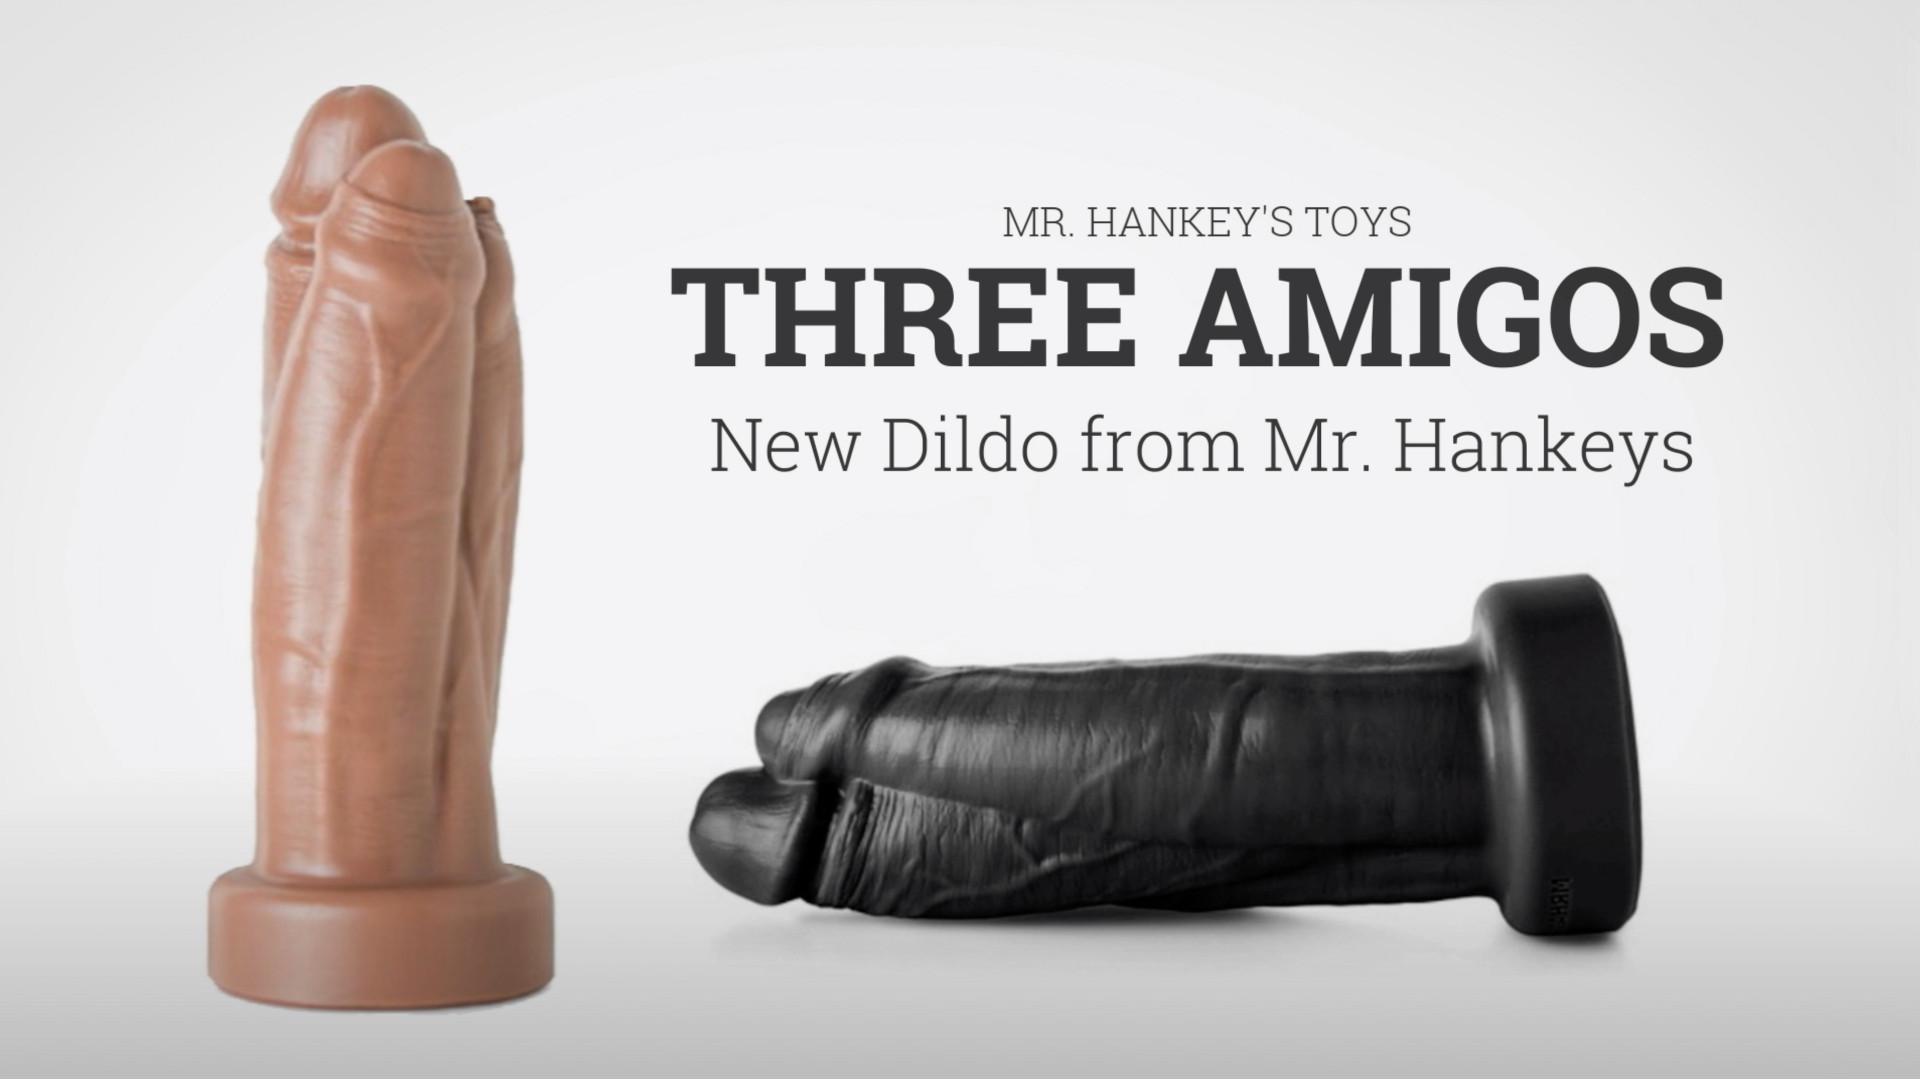 New Mr. Hankey's Toys Three Amigos dildo – Get three for one with the Three Amigos!